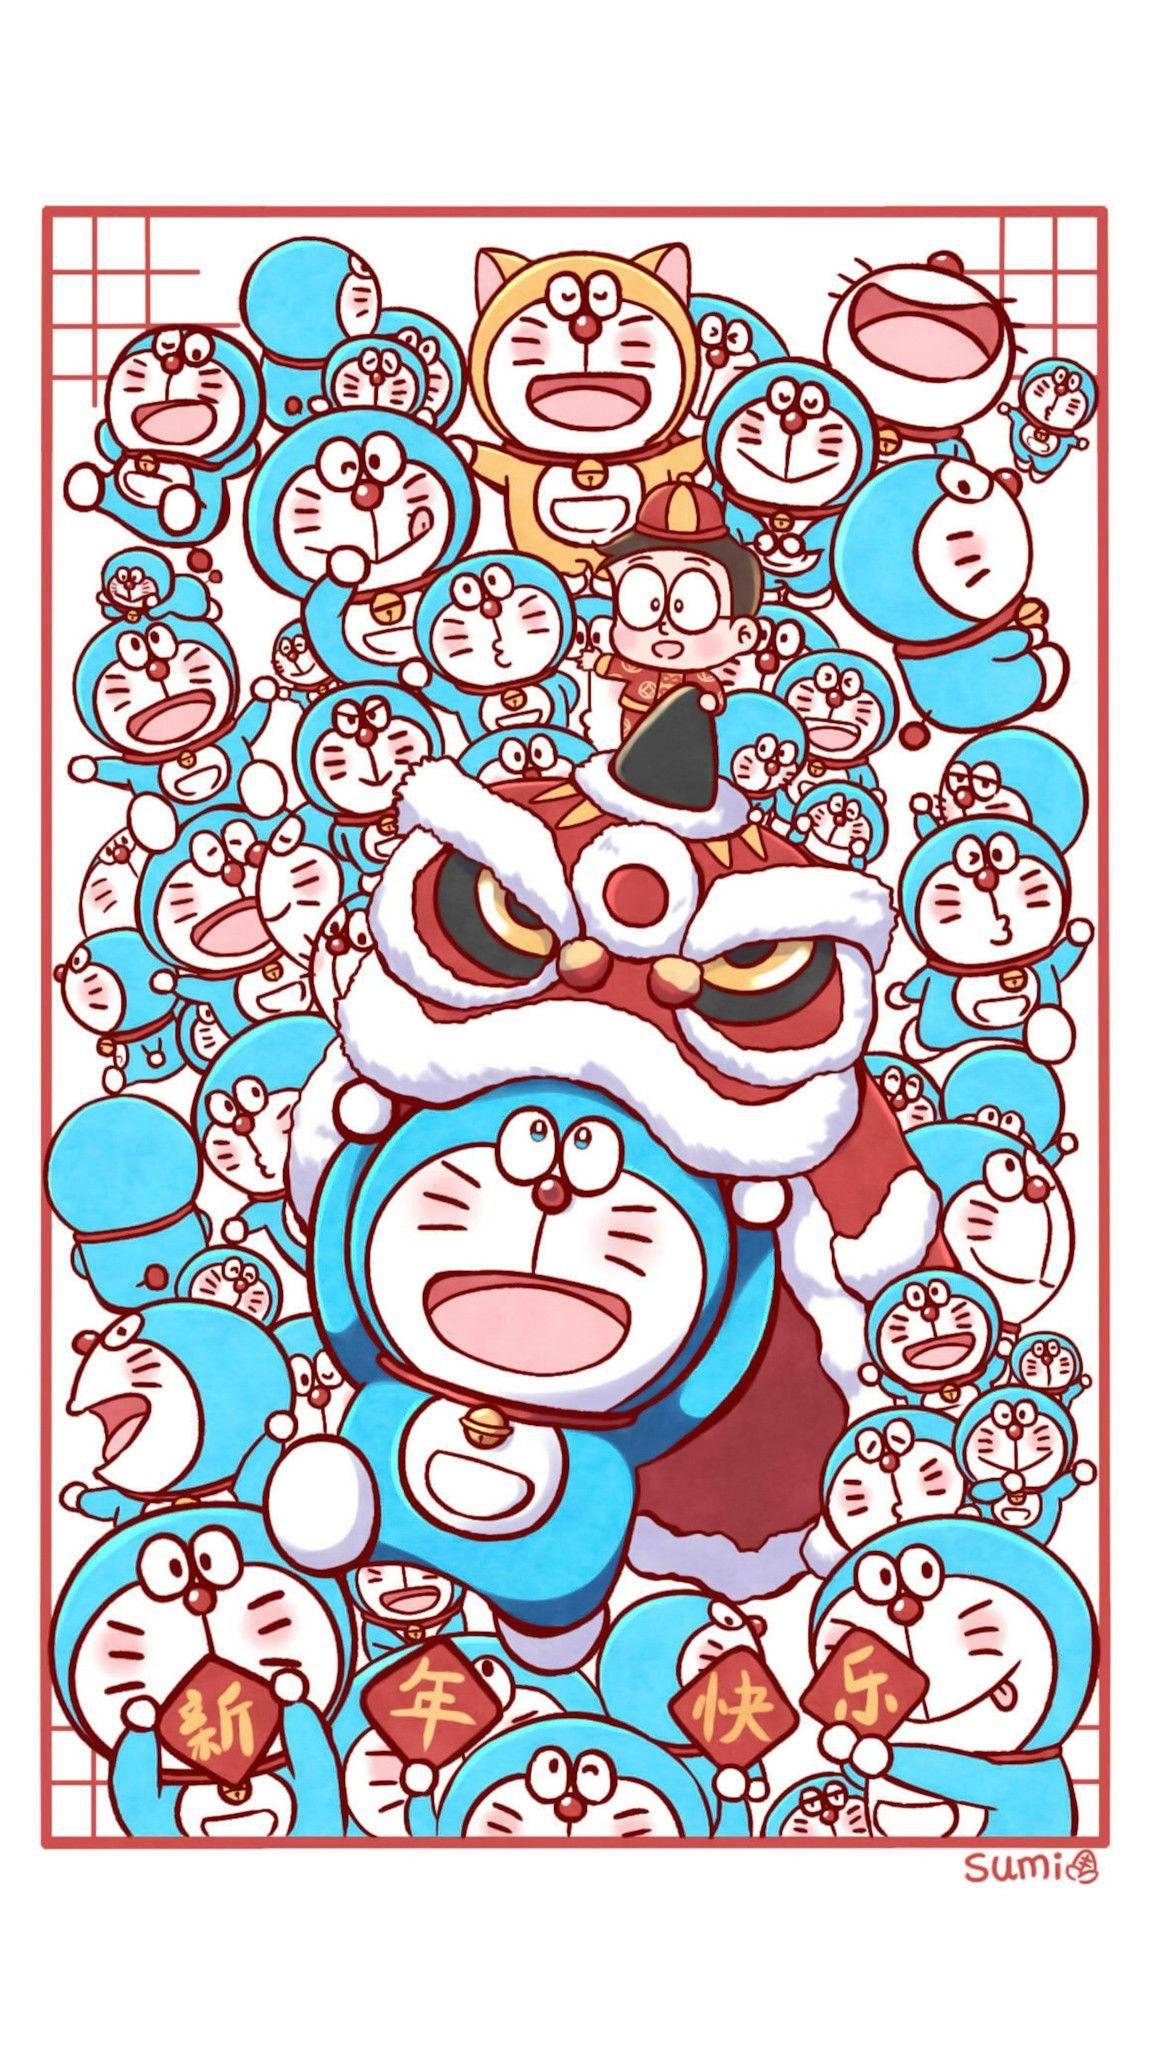 Ghim của wiwin prayitno trên Doraemon ☆ BG trong 2020